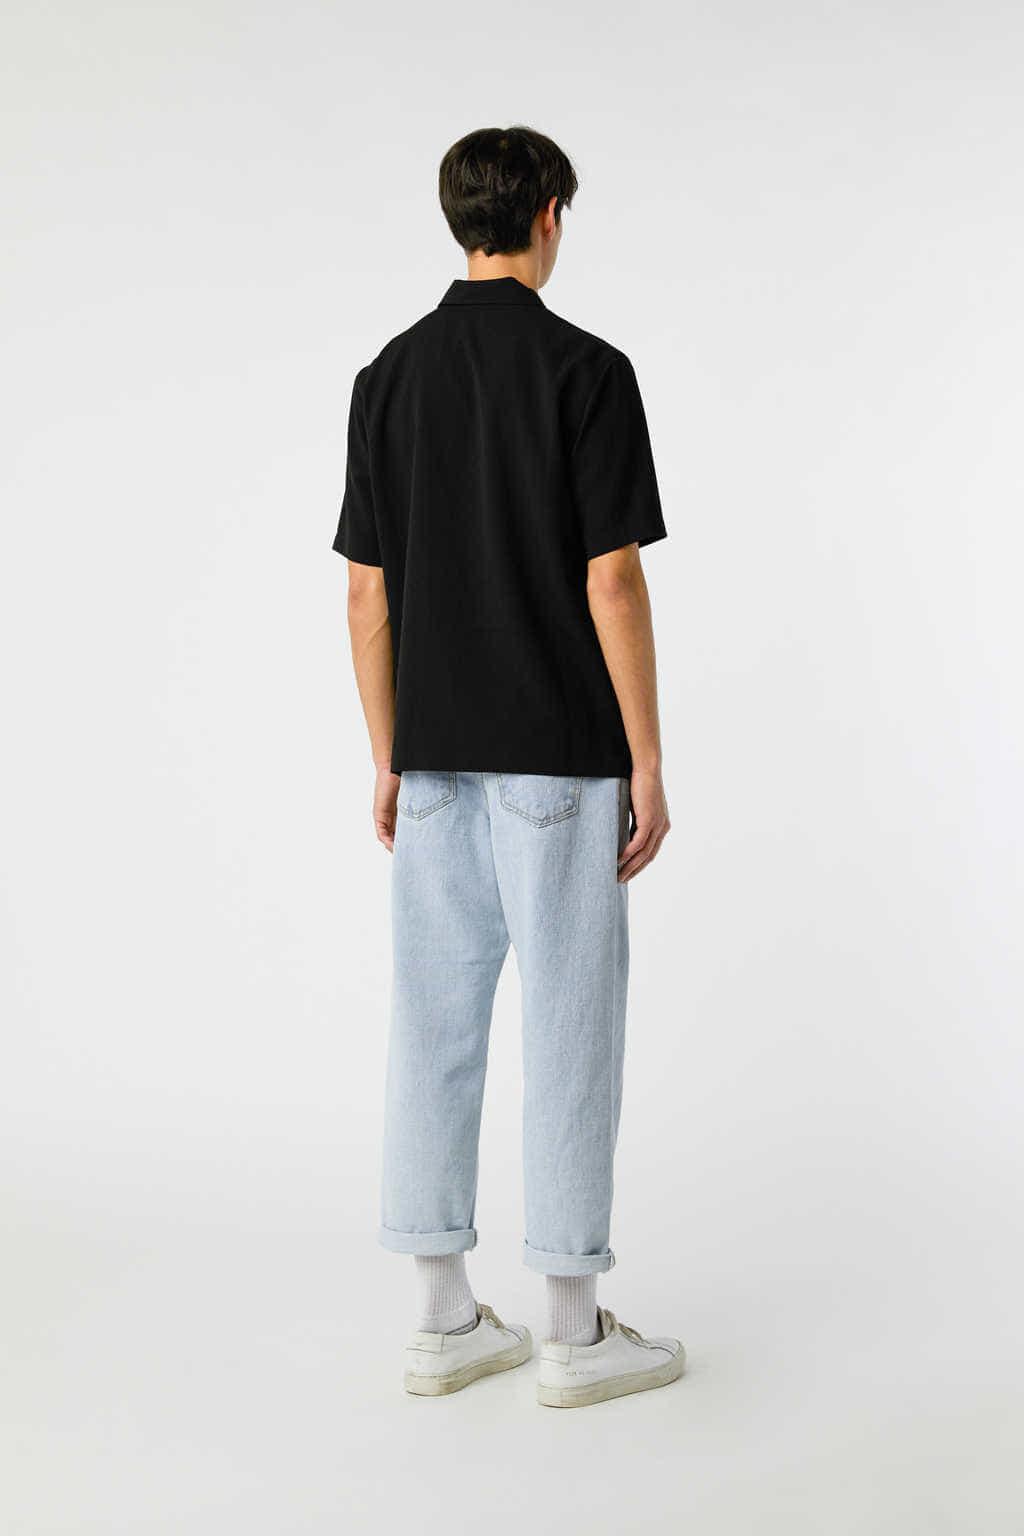 Shirt 3139 Black 11